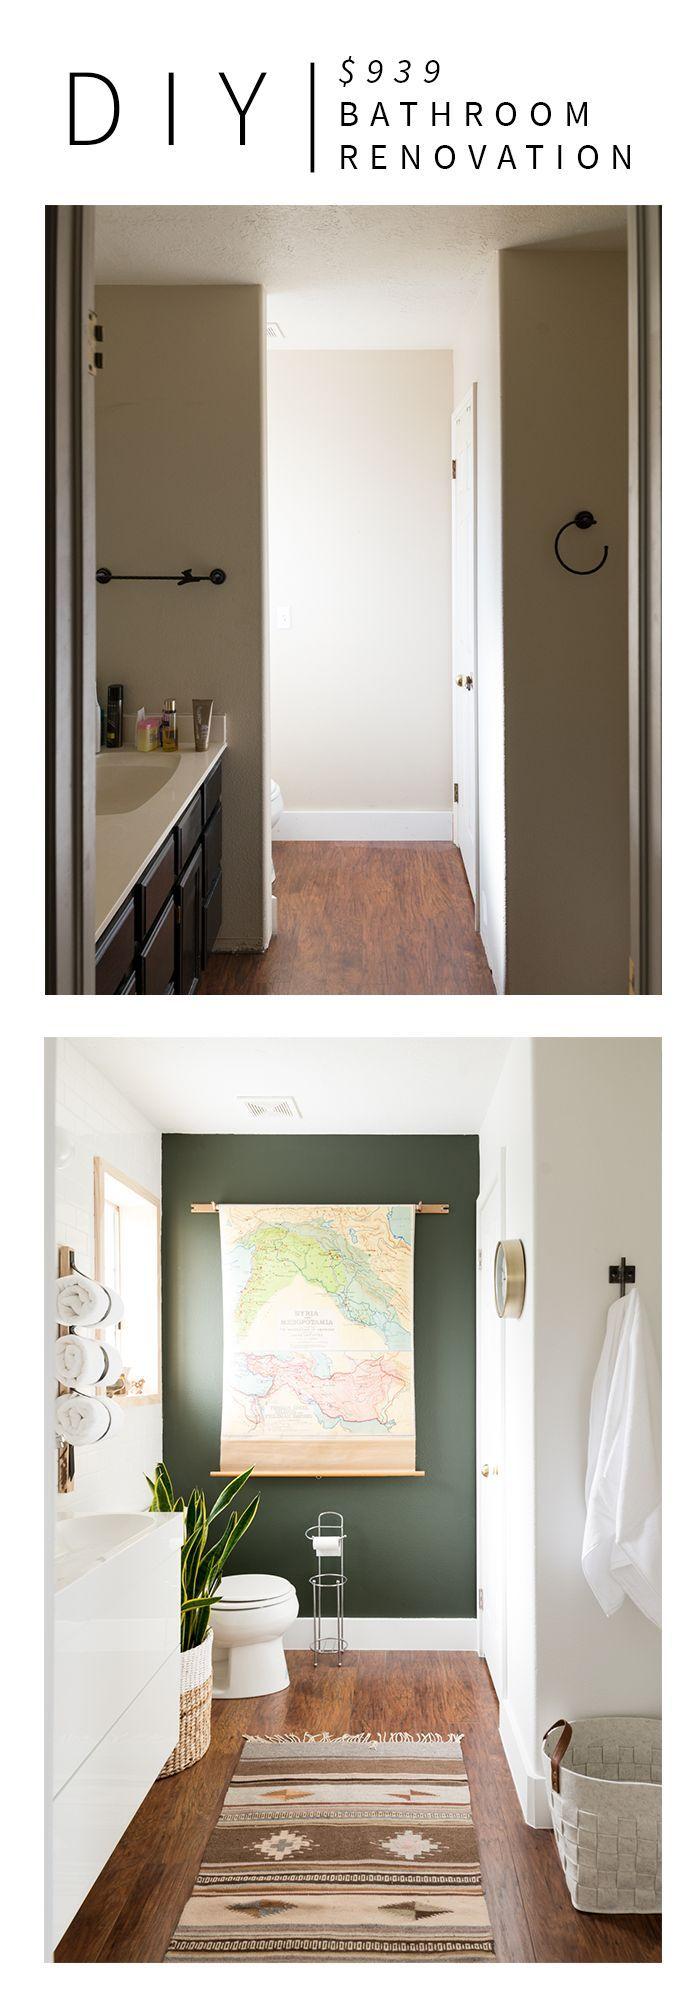 341 best home improvement images on Pinterest | Bath remodel ...